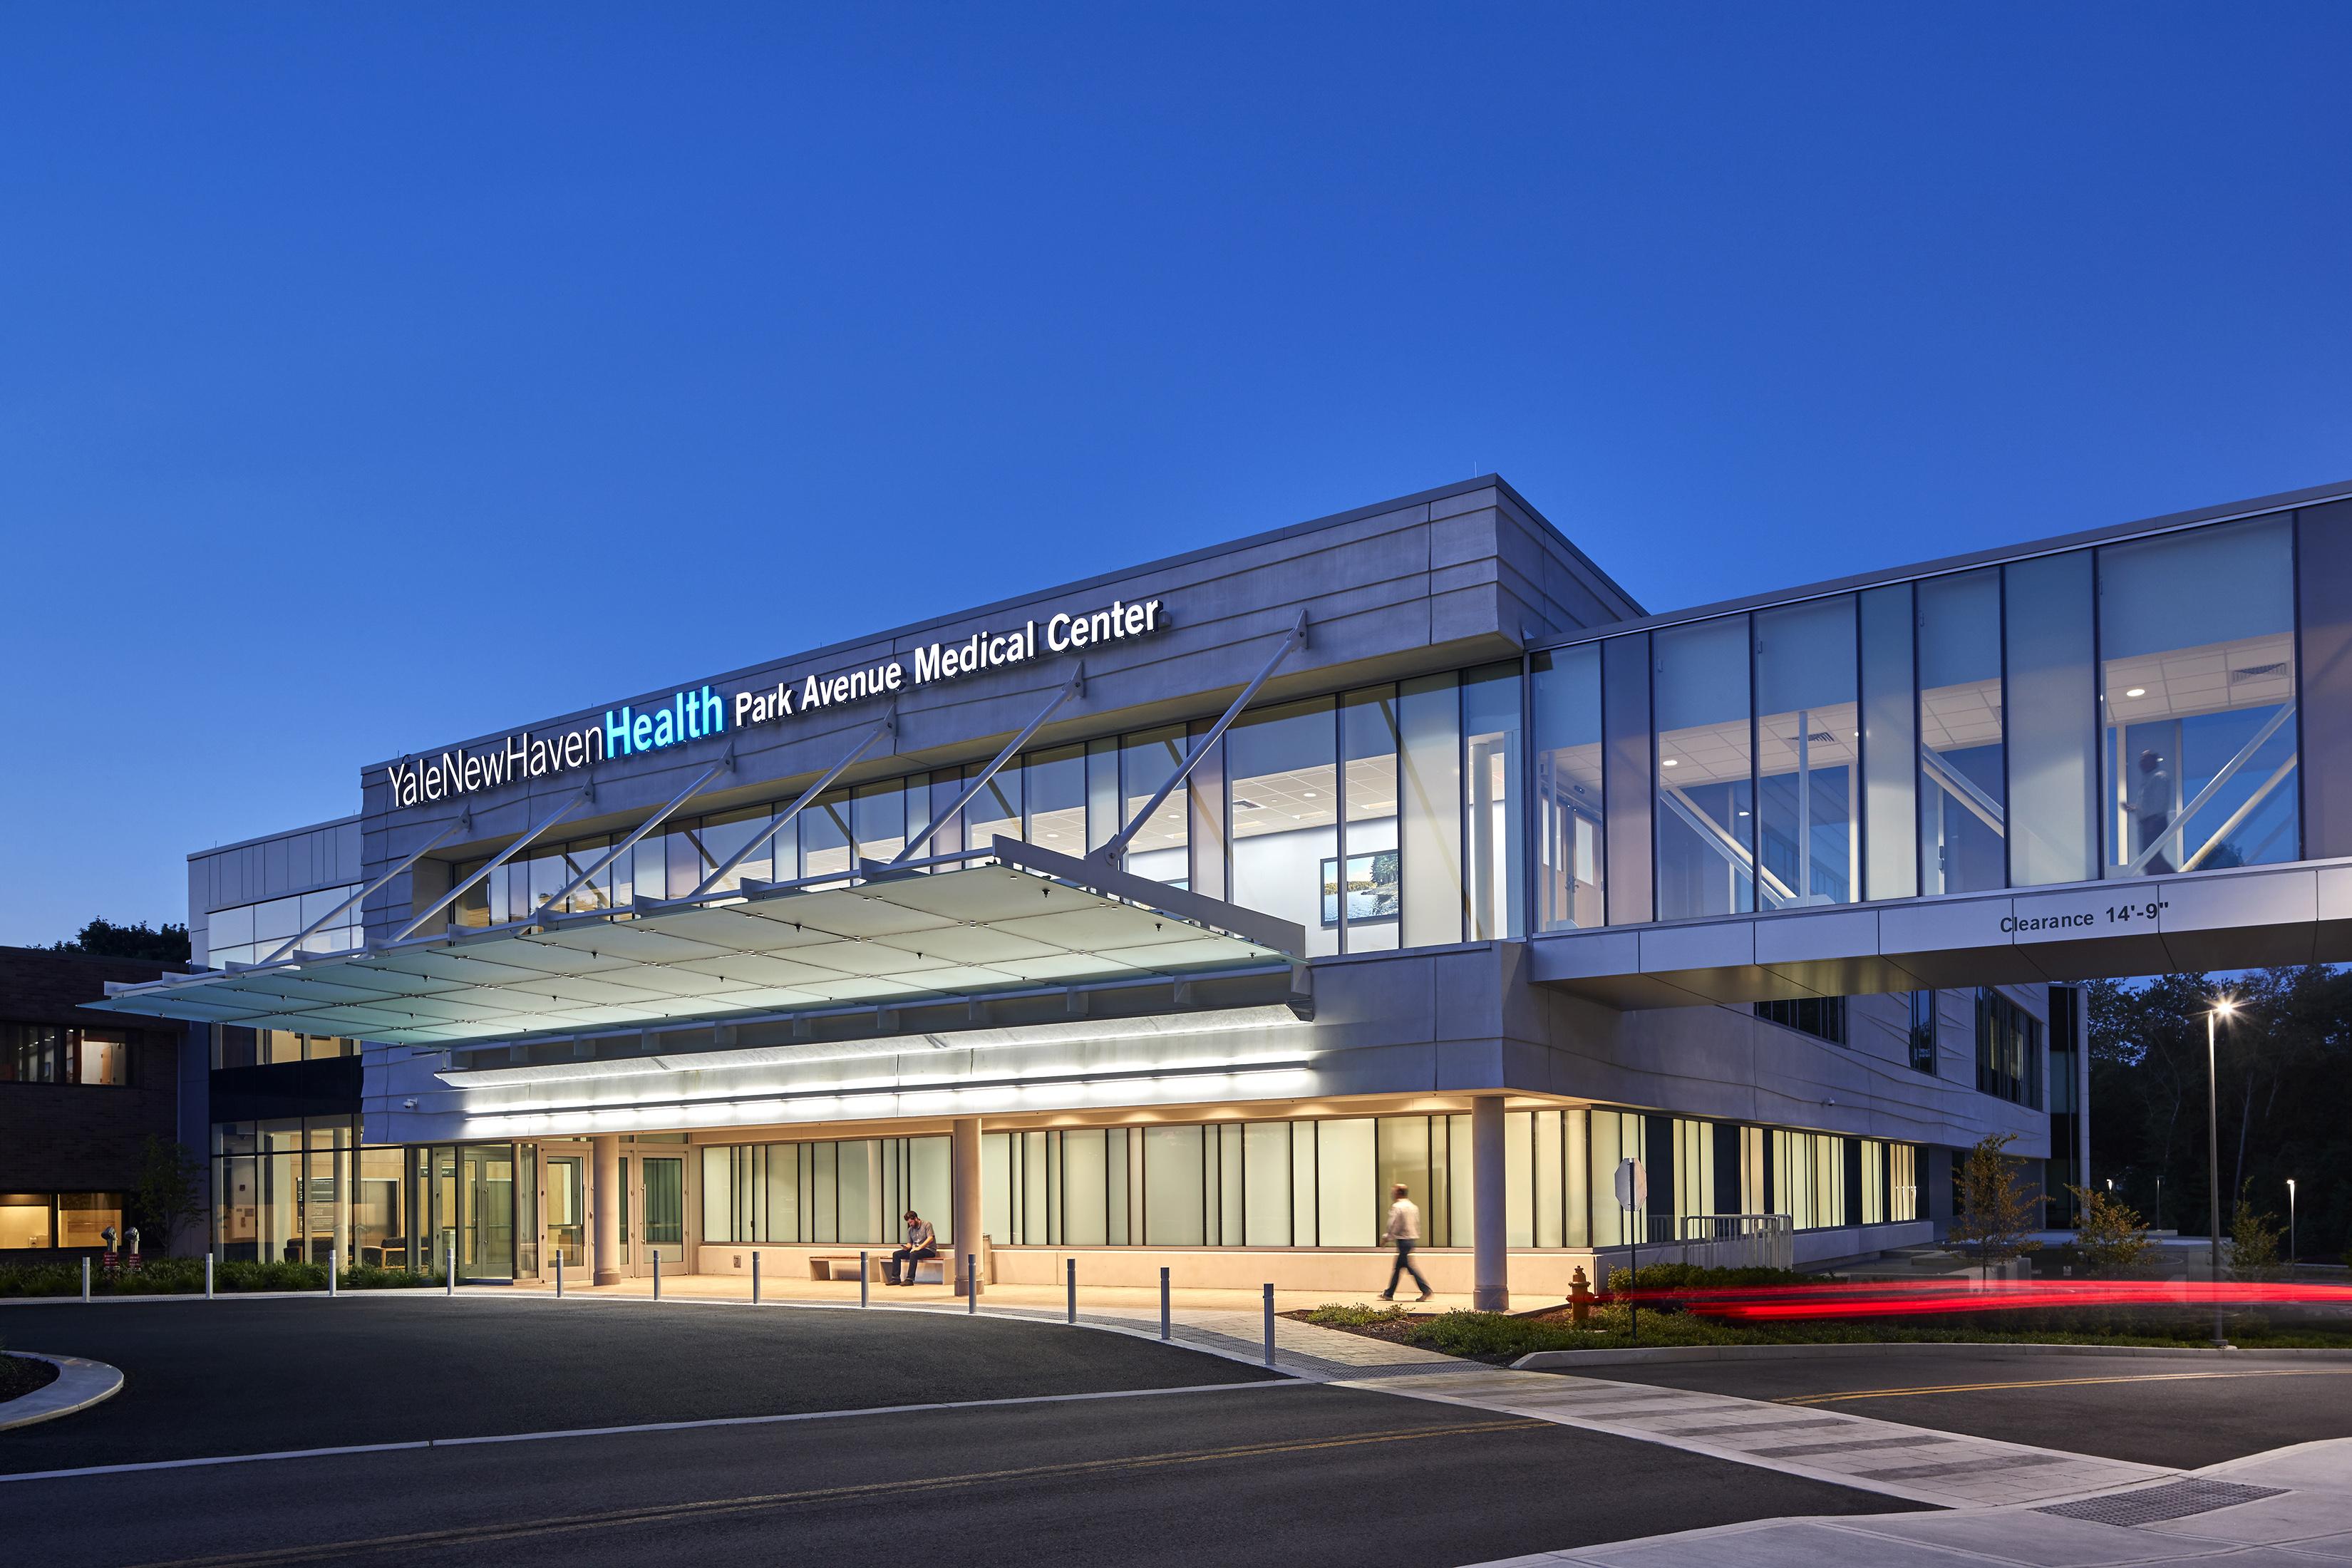 park avenue medical center